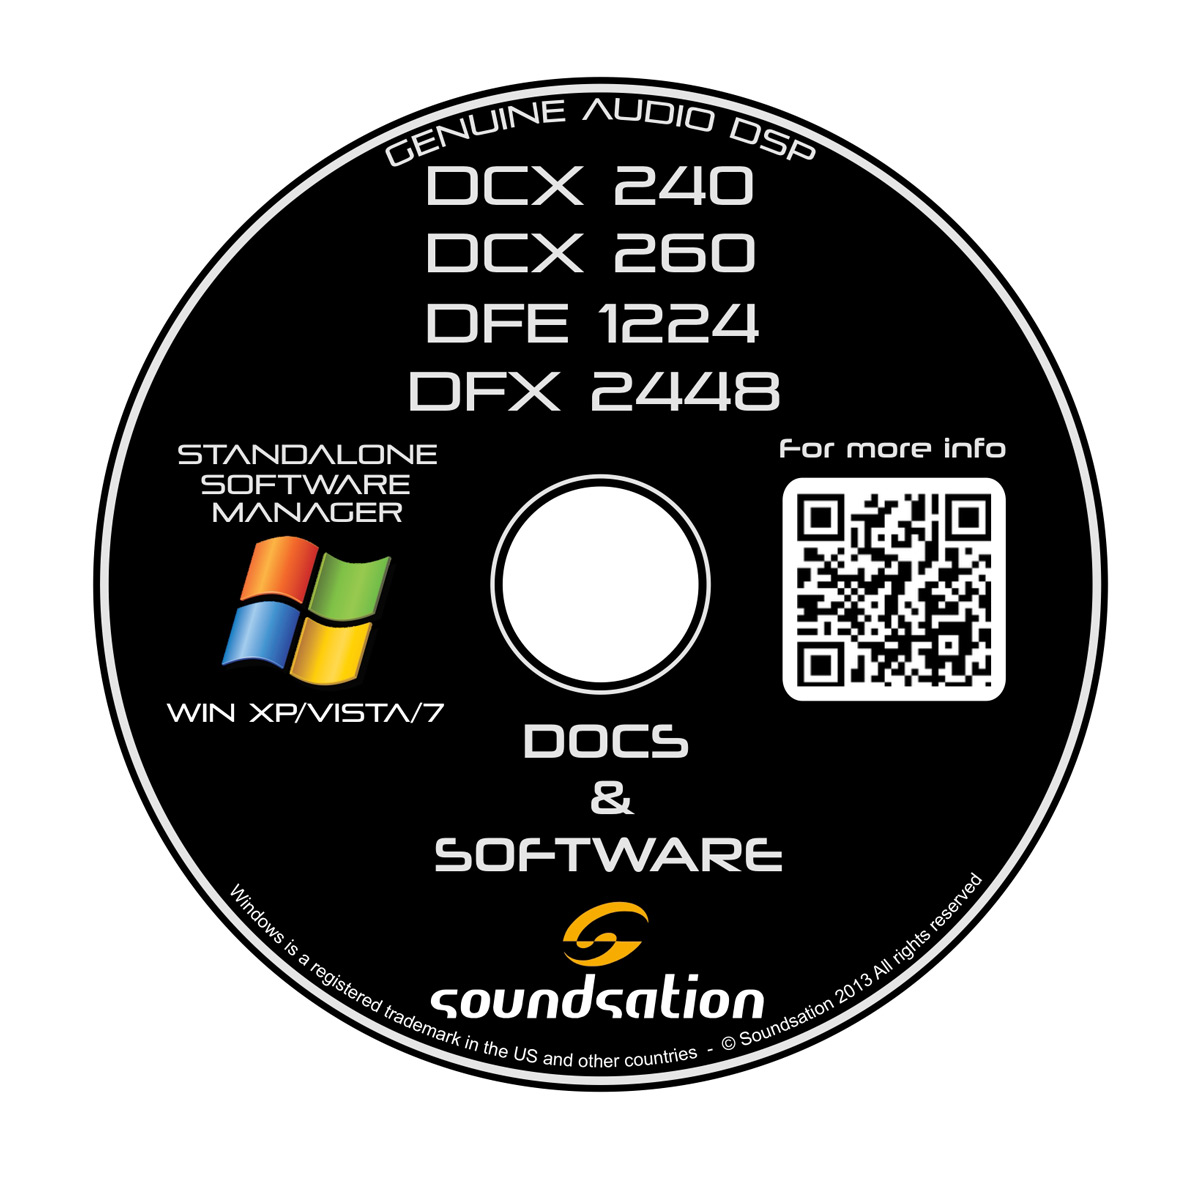 PROCESSORE DIGITALE MULTIEFFETTO SOUNDSATION DFX2448